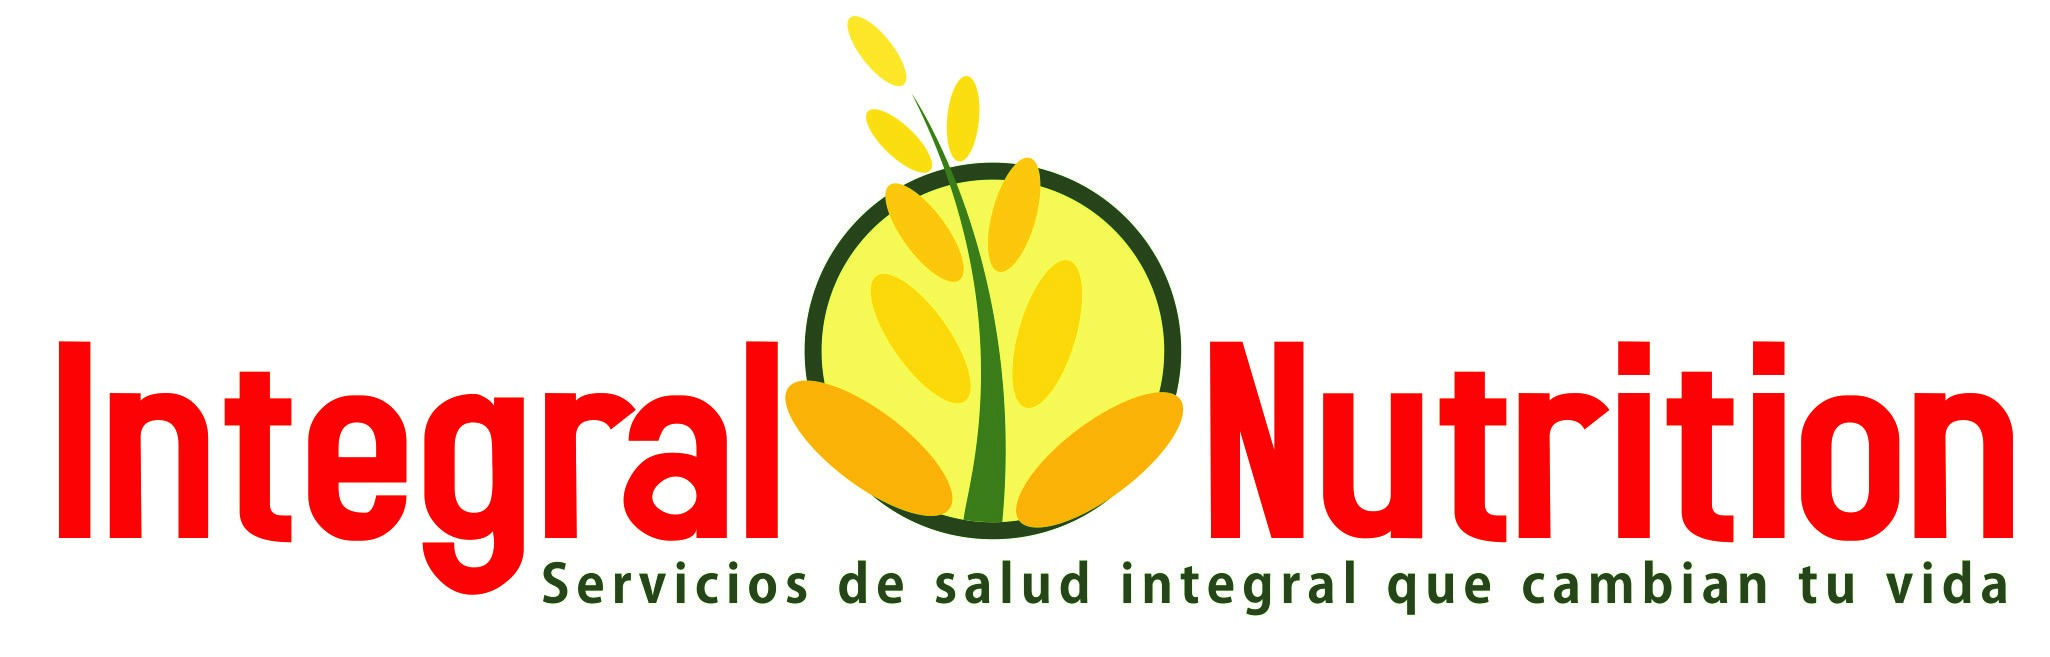 Integral Nutrition Mariela Alva